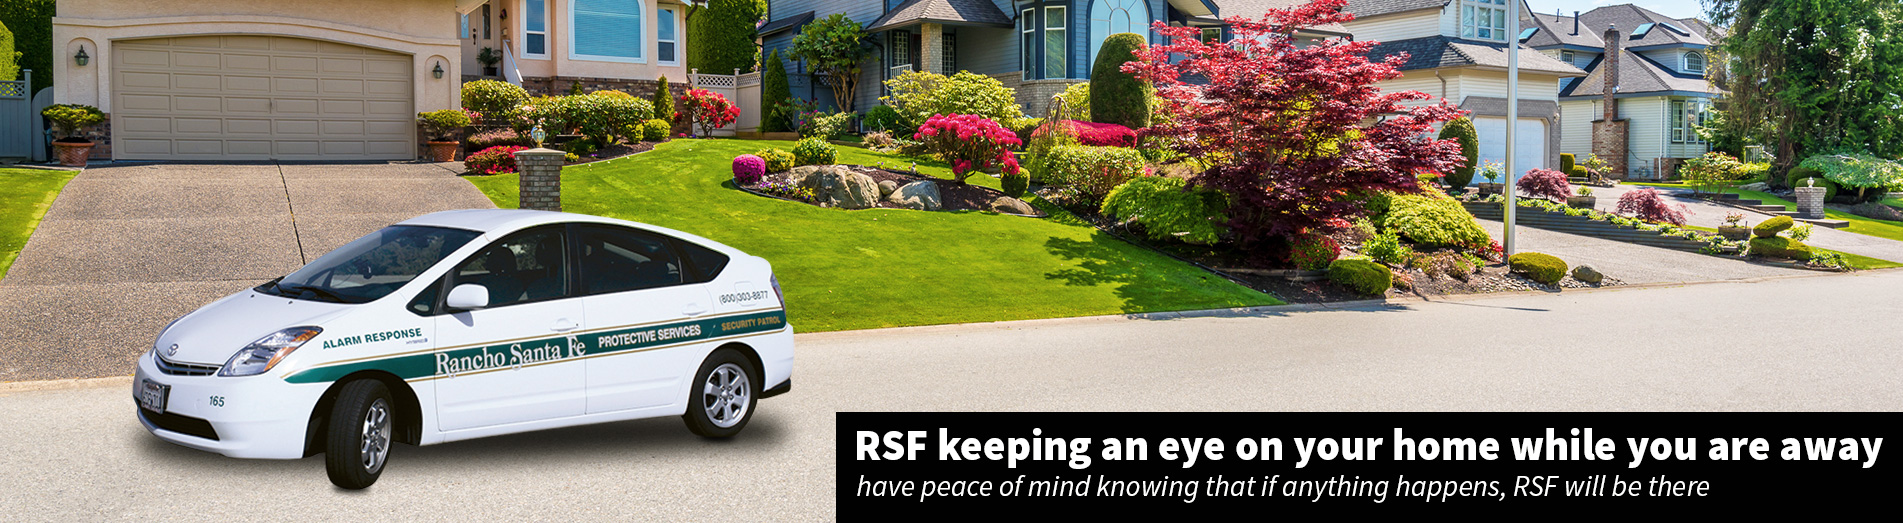 res-patrol-response-banner-update